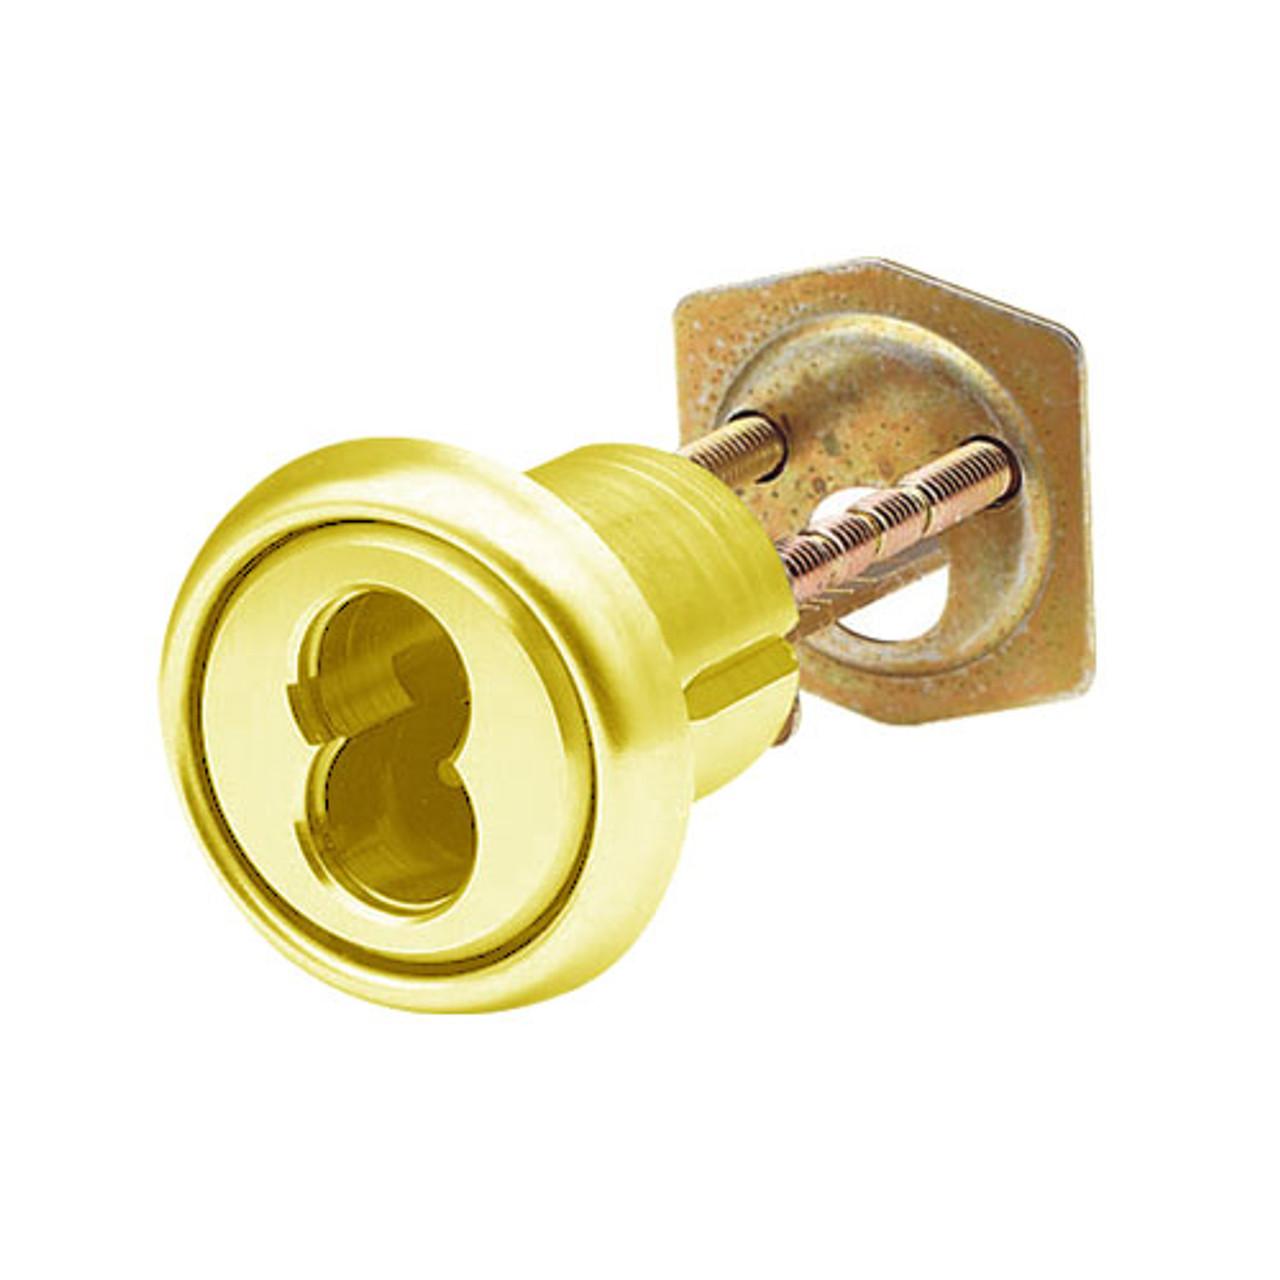 16RCR-27-03 Arrow Lock Rim Interchangeable Cylinder 7 Pin Housing in Bright Brass